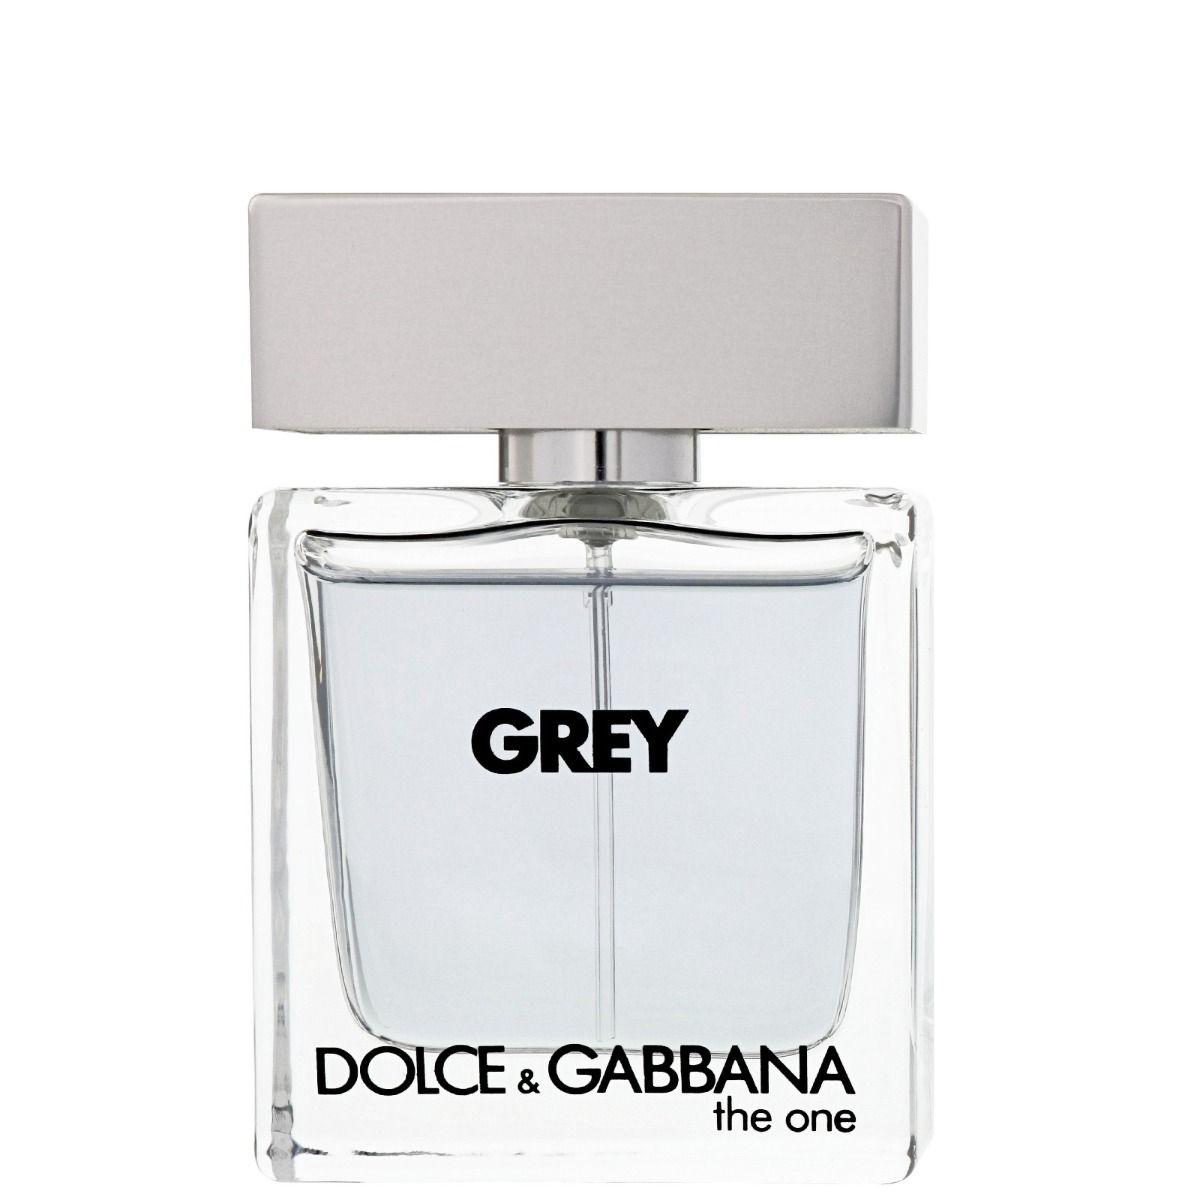 Dolce & Gabbana The One Grey For Men Edt Intense 50ml